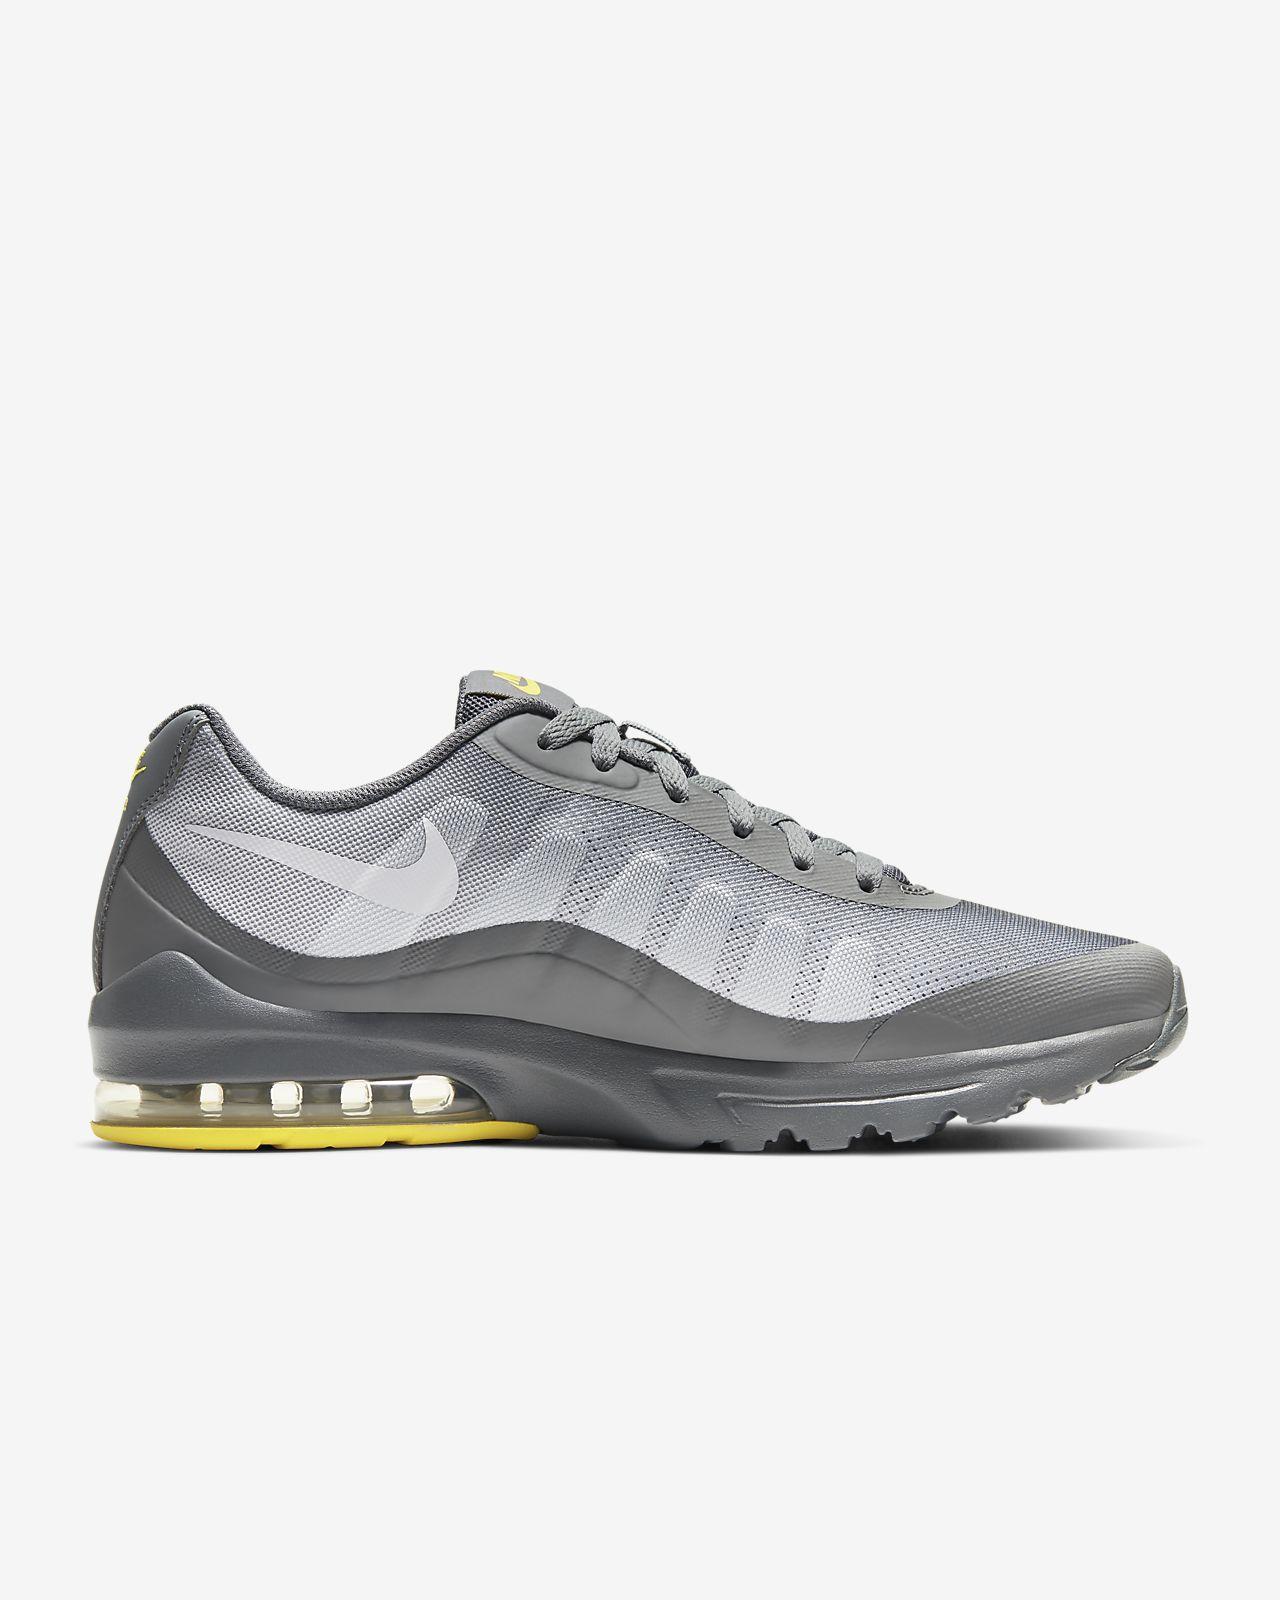 Chaussure Nike Air Max Invigor pour Homme. Nike MA